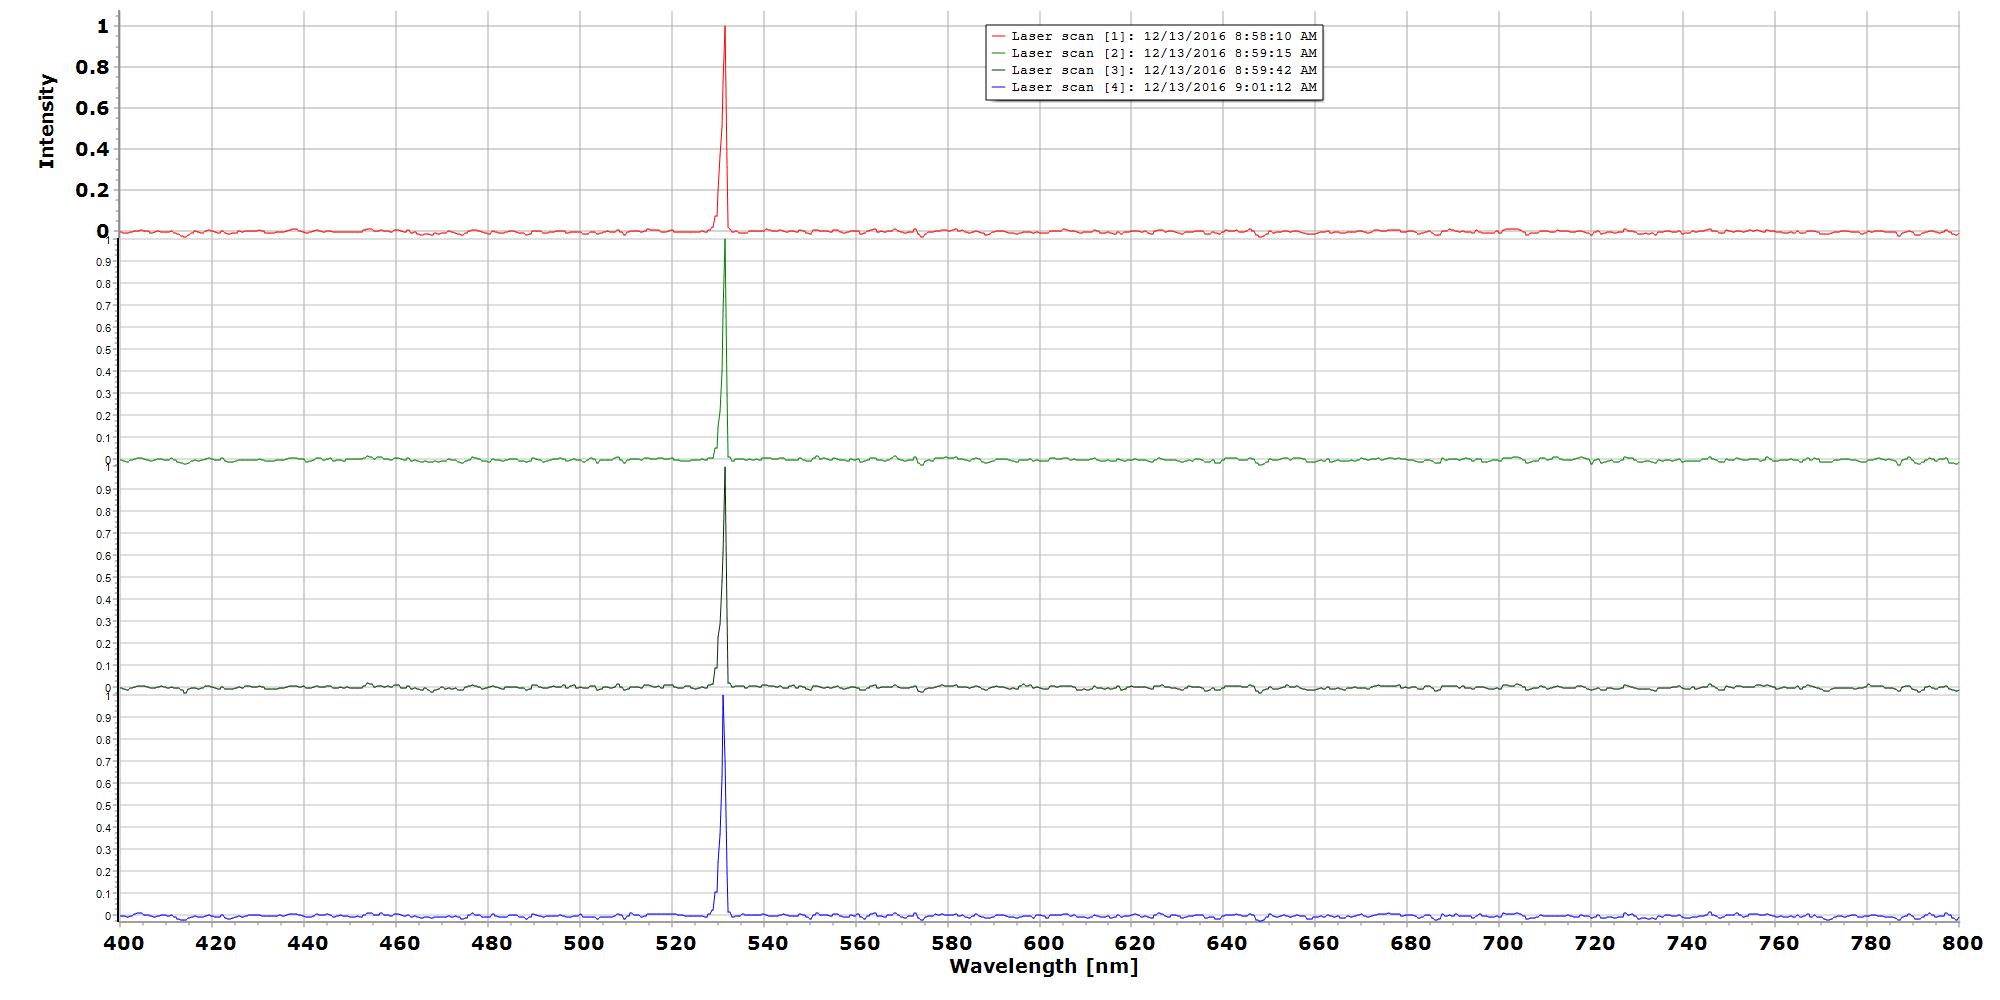 Dav5 V301 Raman Spectrometer Details Voltage Converter 3v To 5v Using Max660 150mw Aries Dpss Laser 532nm